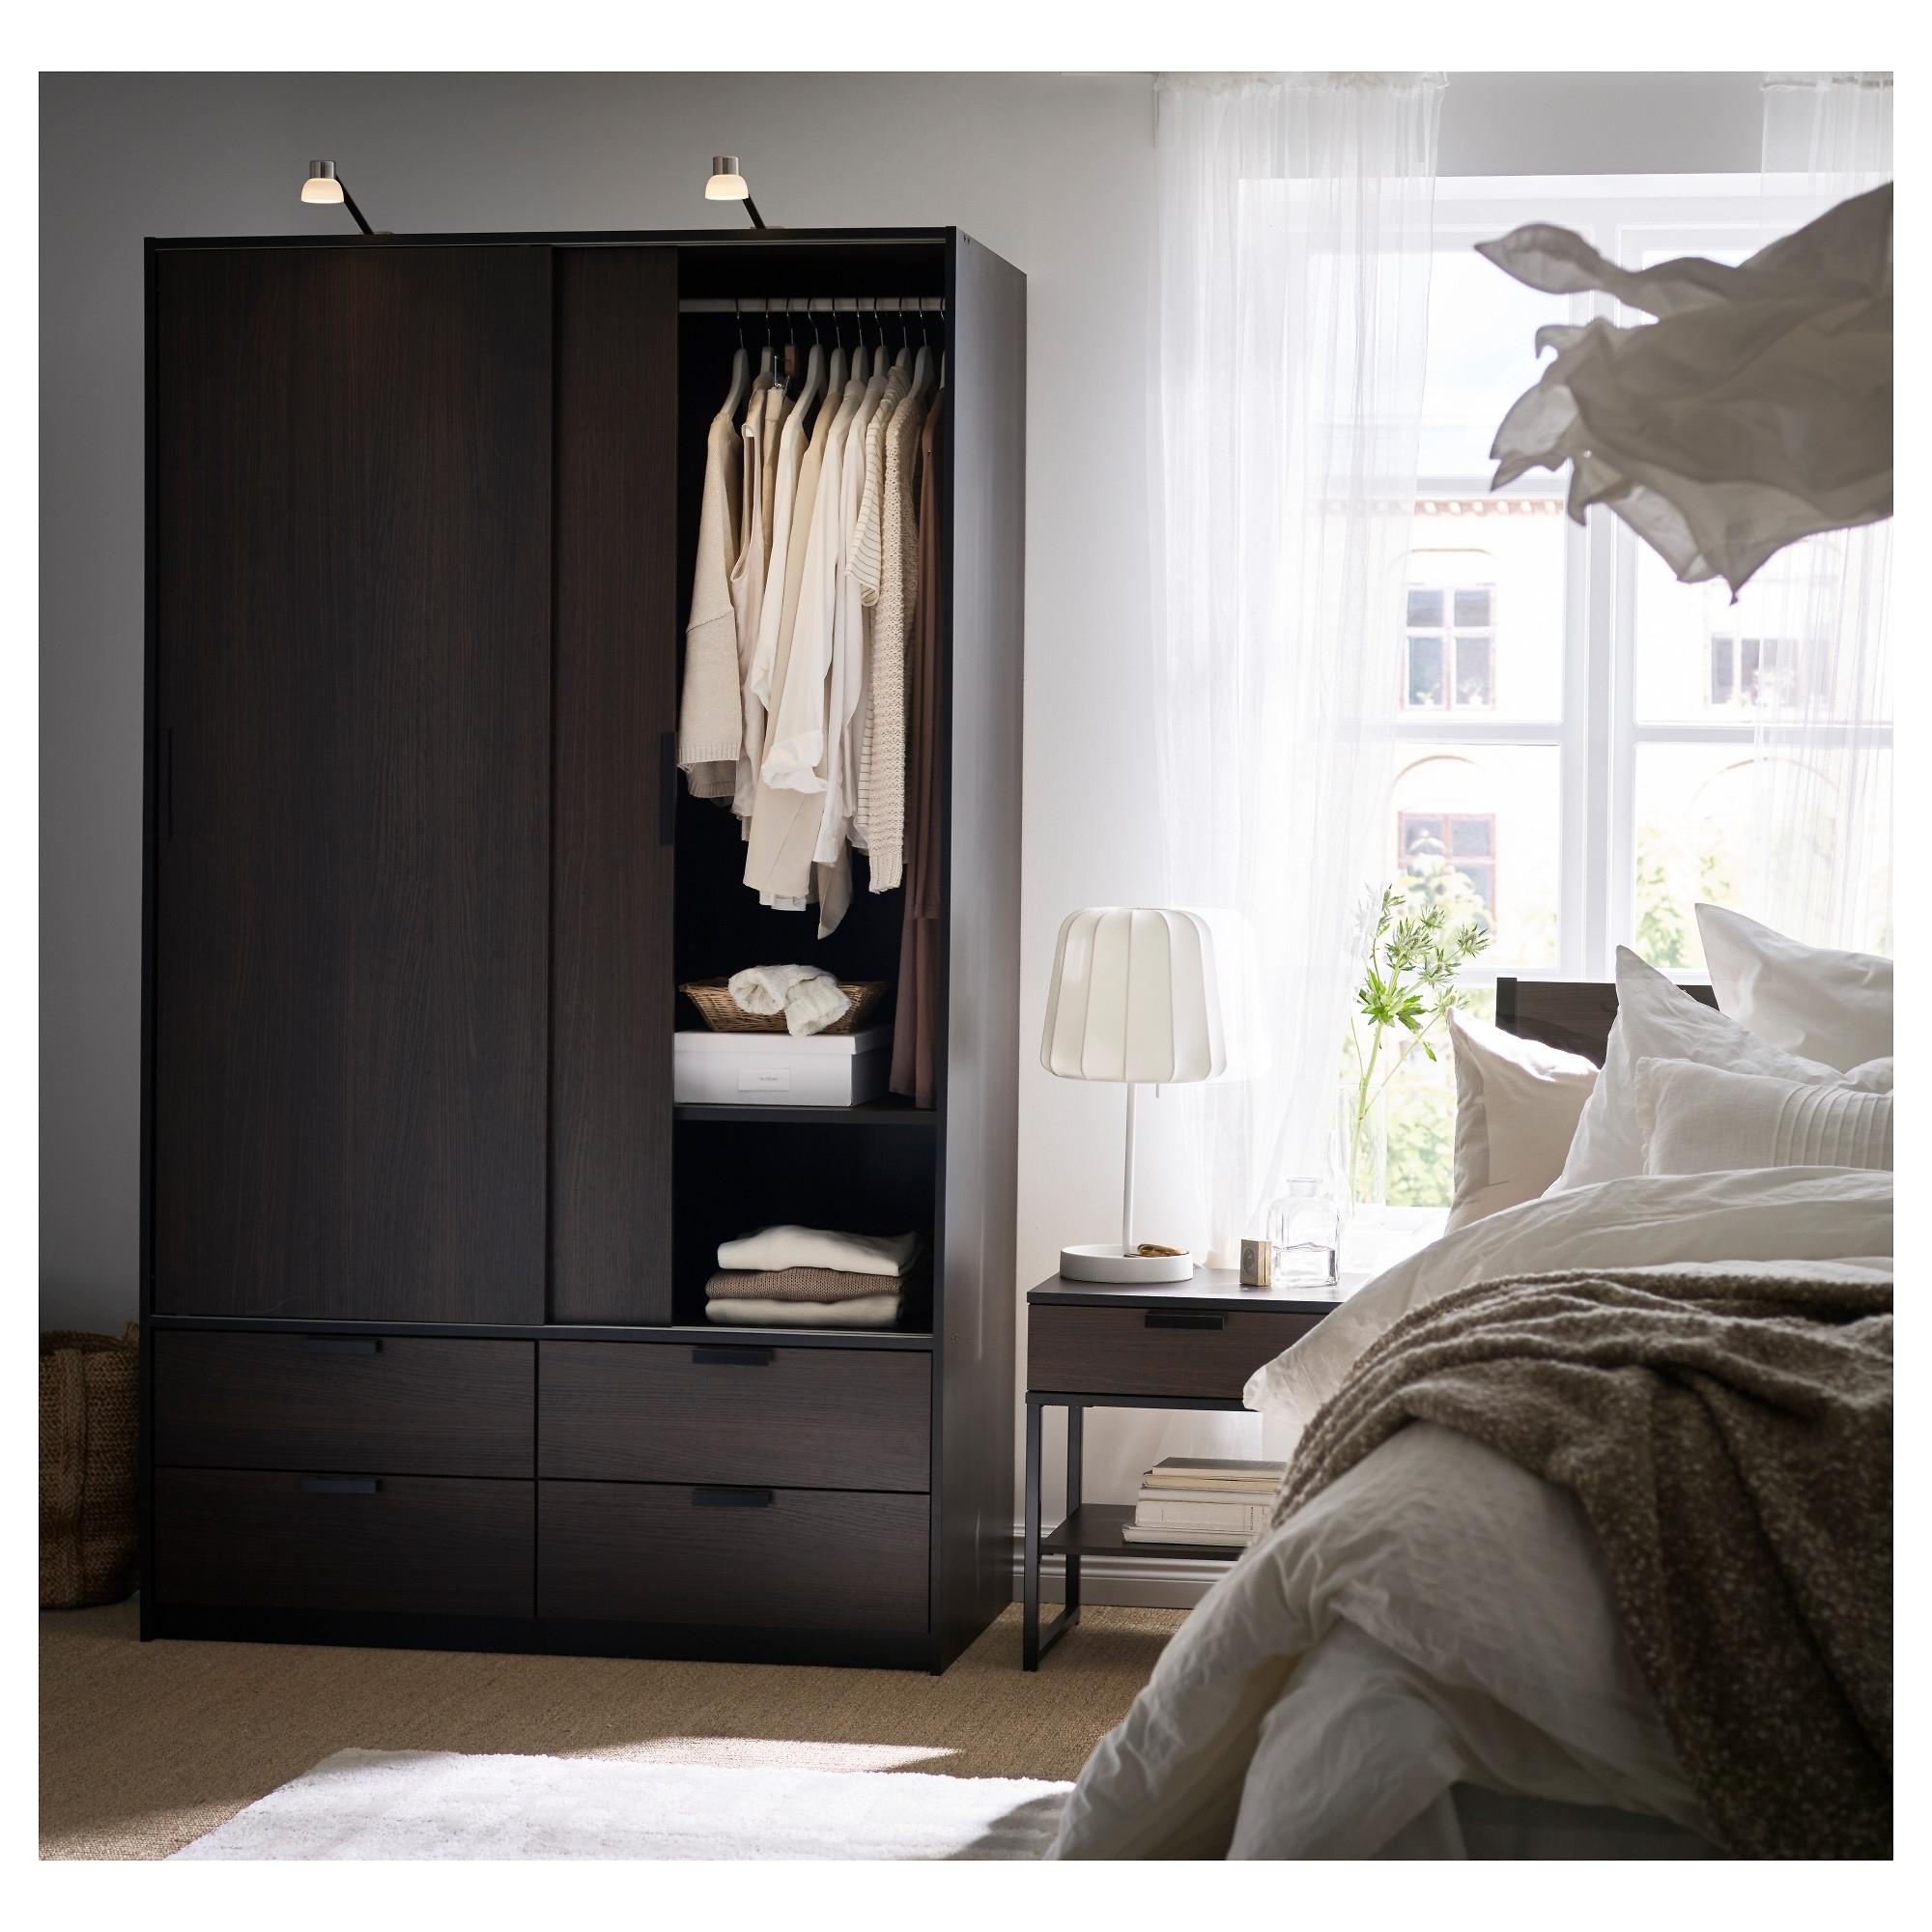 Dark Brown Wardrobes With Regard To Newest Trysil Wardrobe W Sliding Doors/4 Drawers – Dark Brown – Ikea (View 8 of 15)